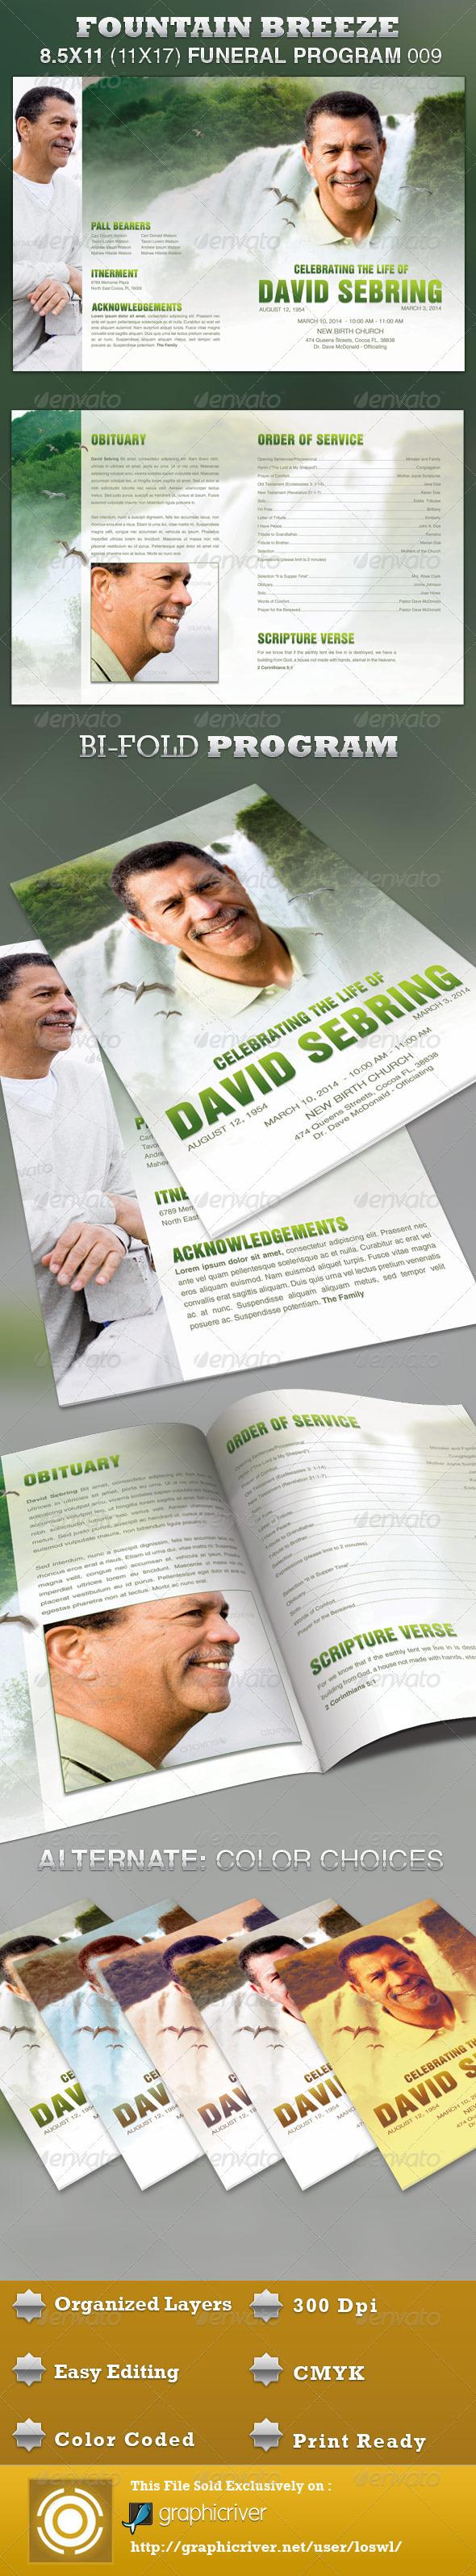 Fountain Breeze Funeral Program Template 009 - Informational Brochures